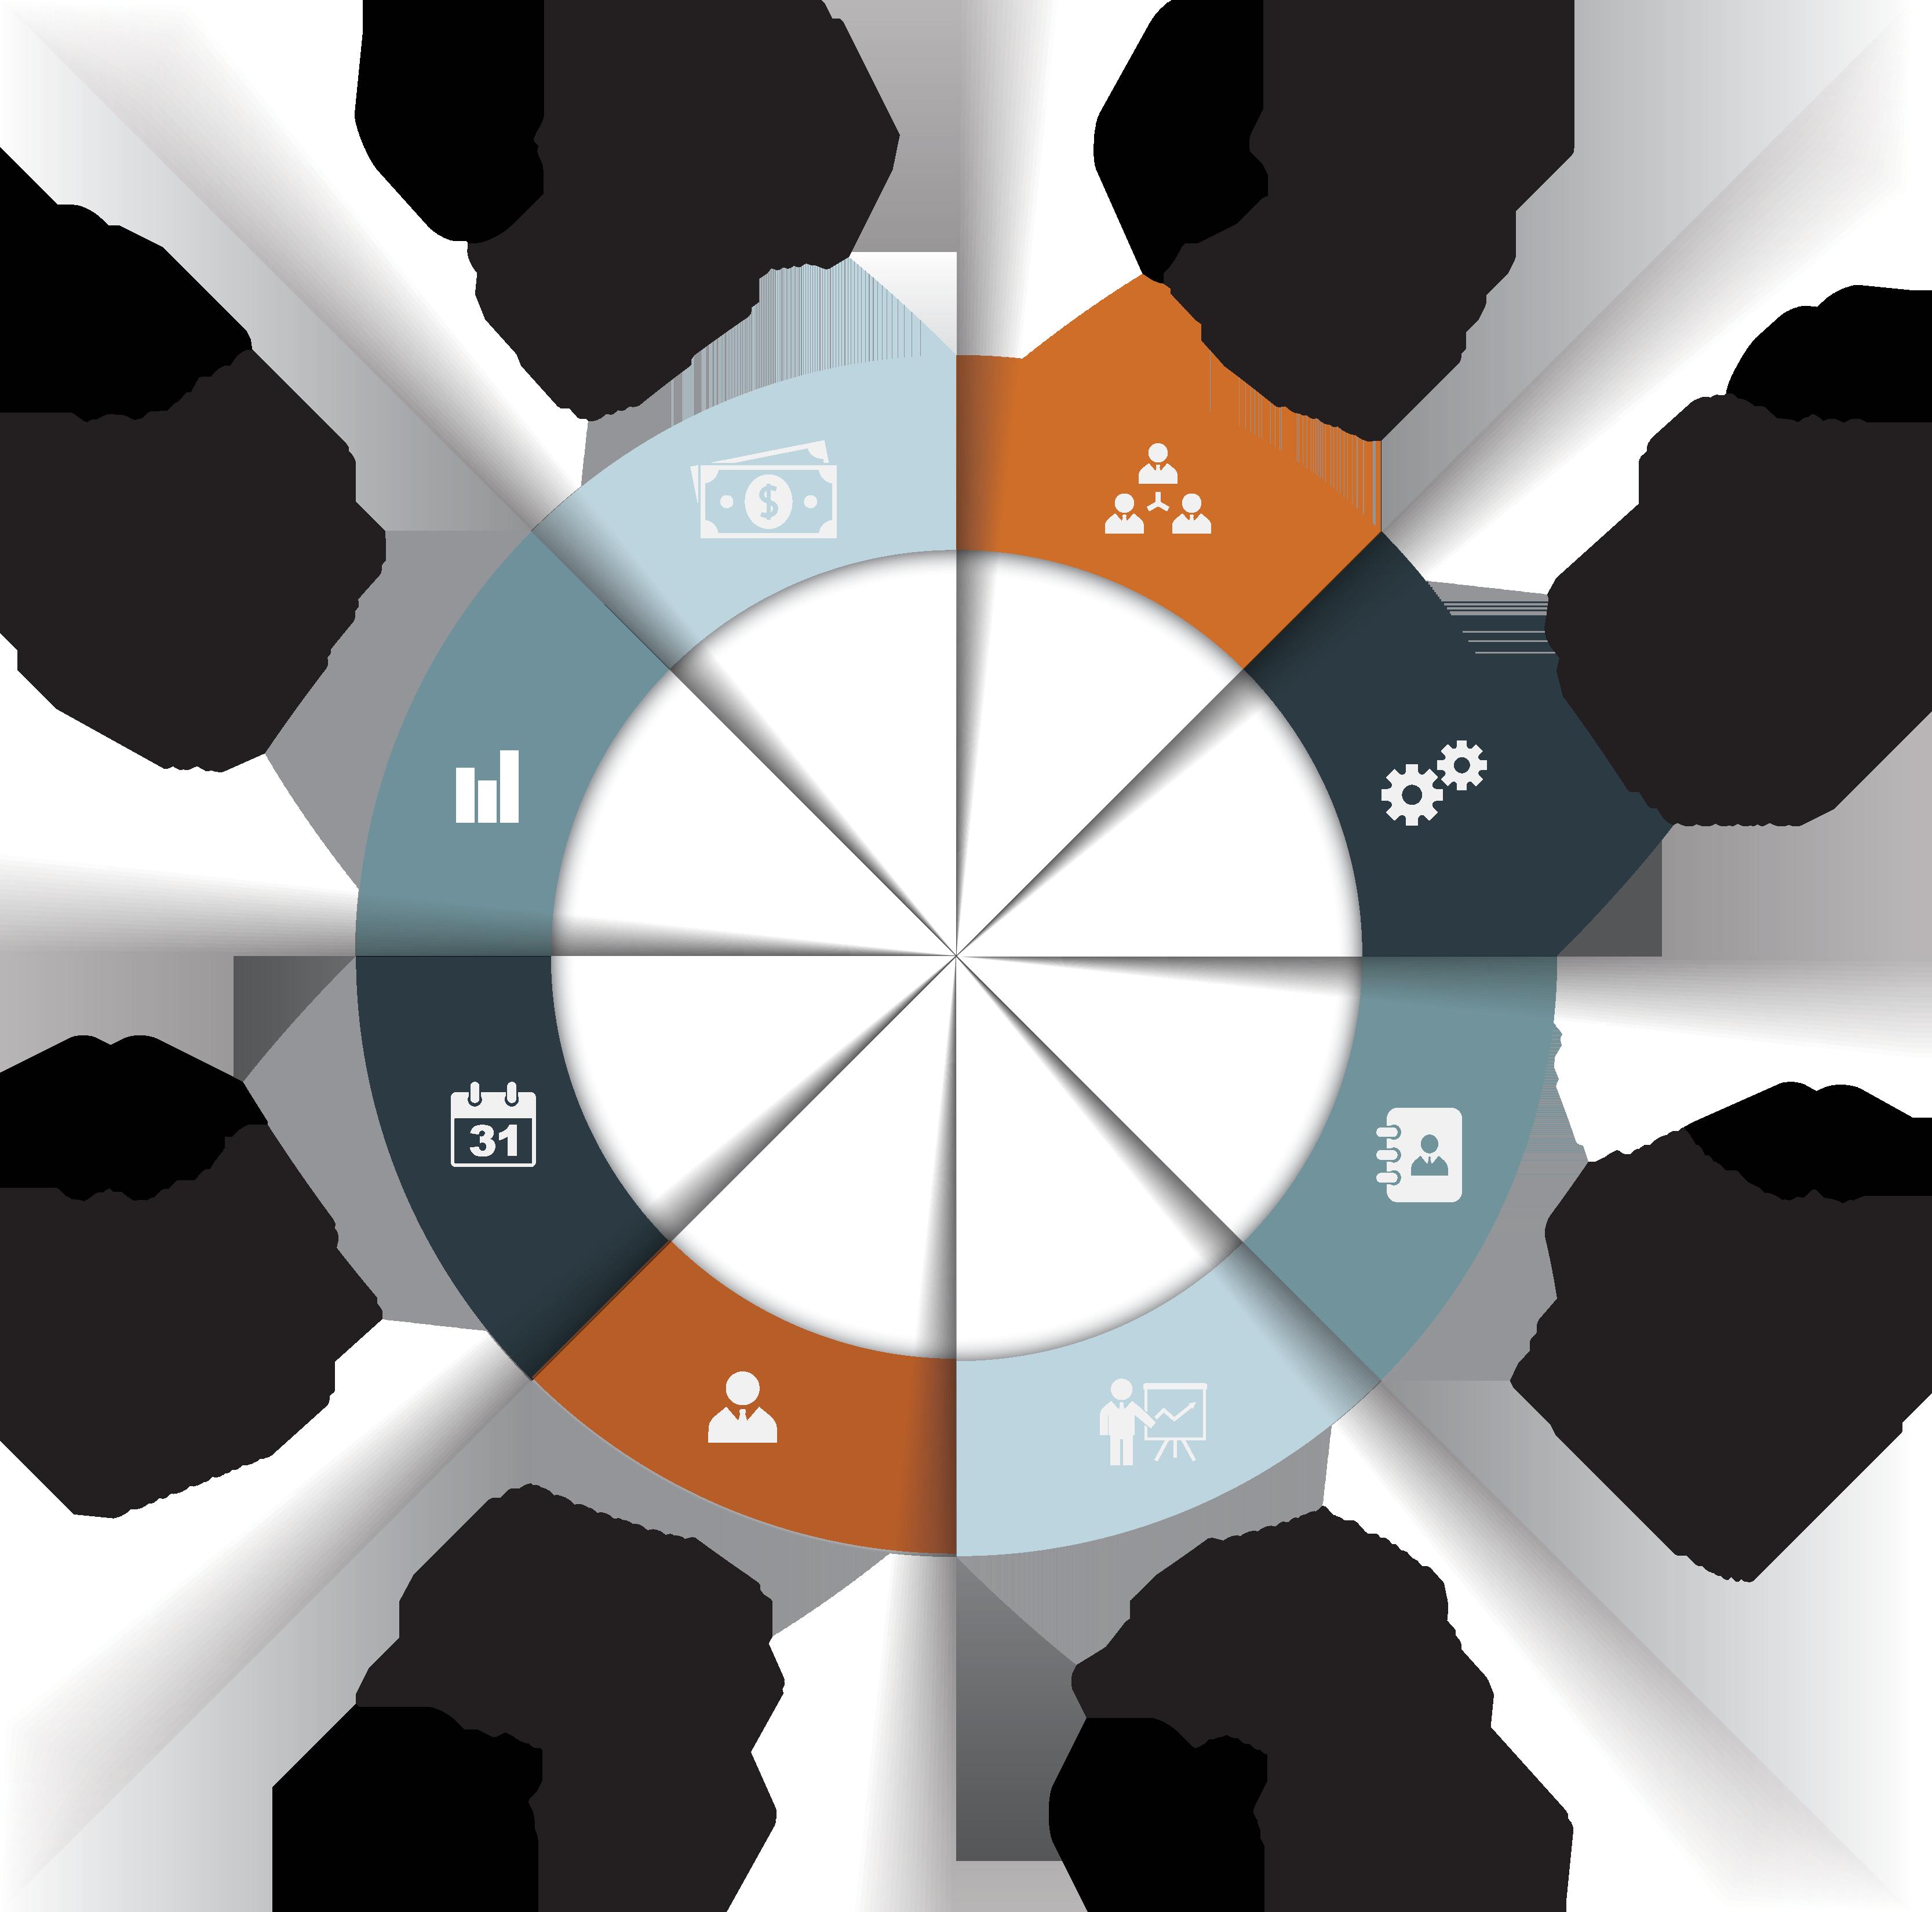 Step 3 – Escalate's 8 Focus Areas for Execution: Priorities, Goals, Mechanics & Measures